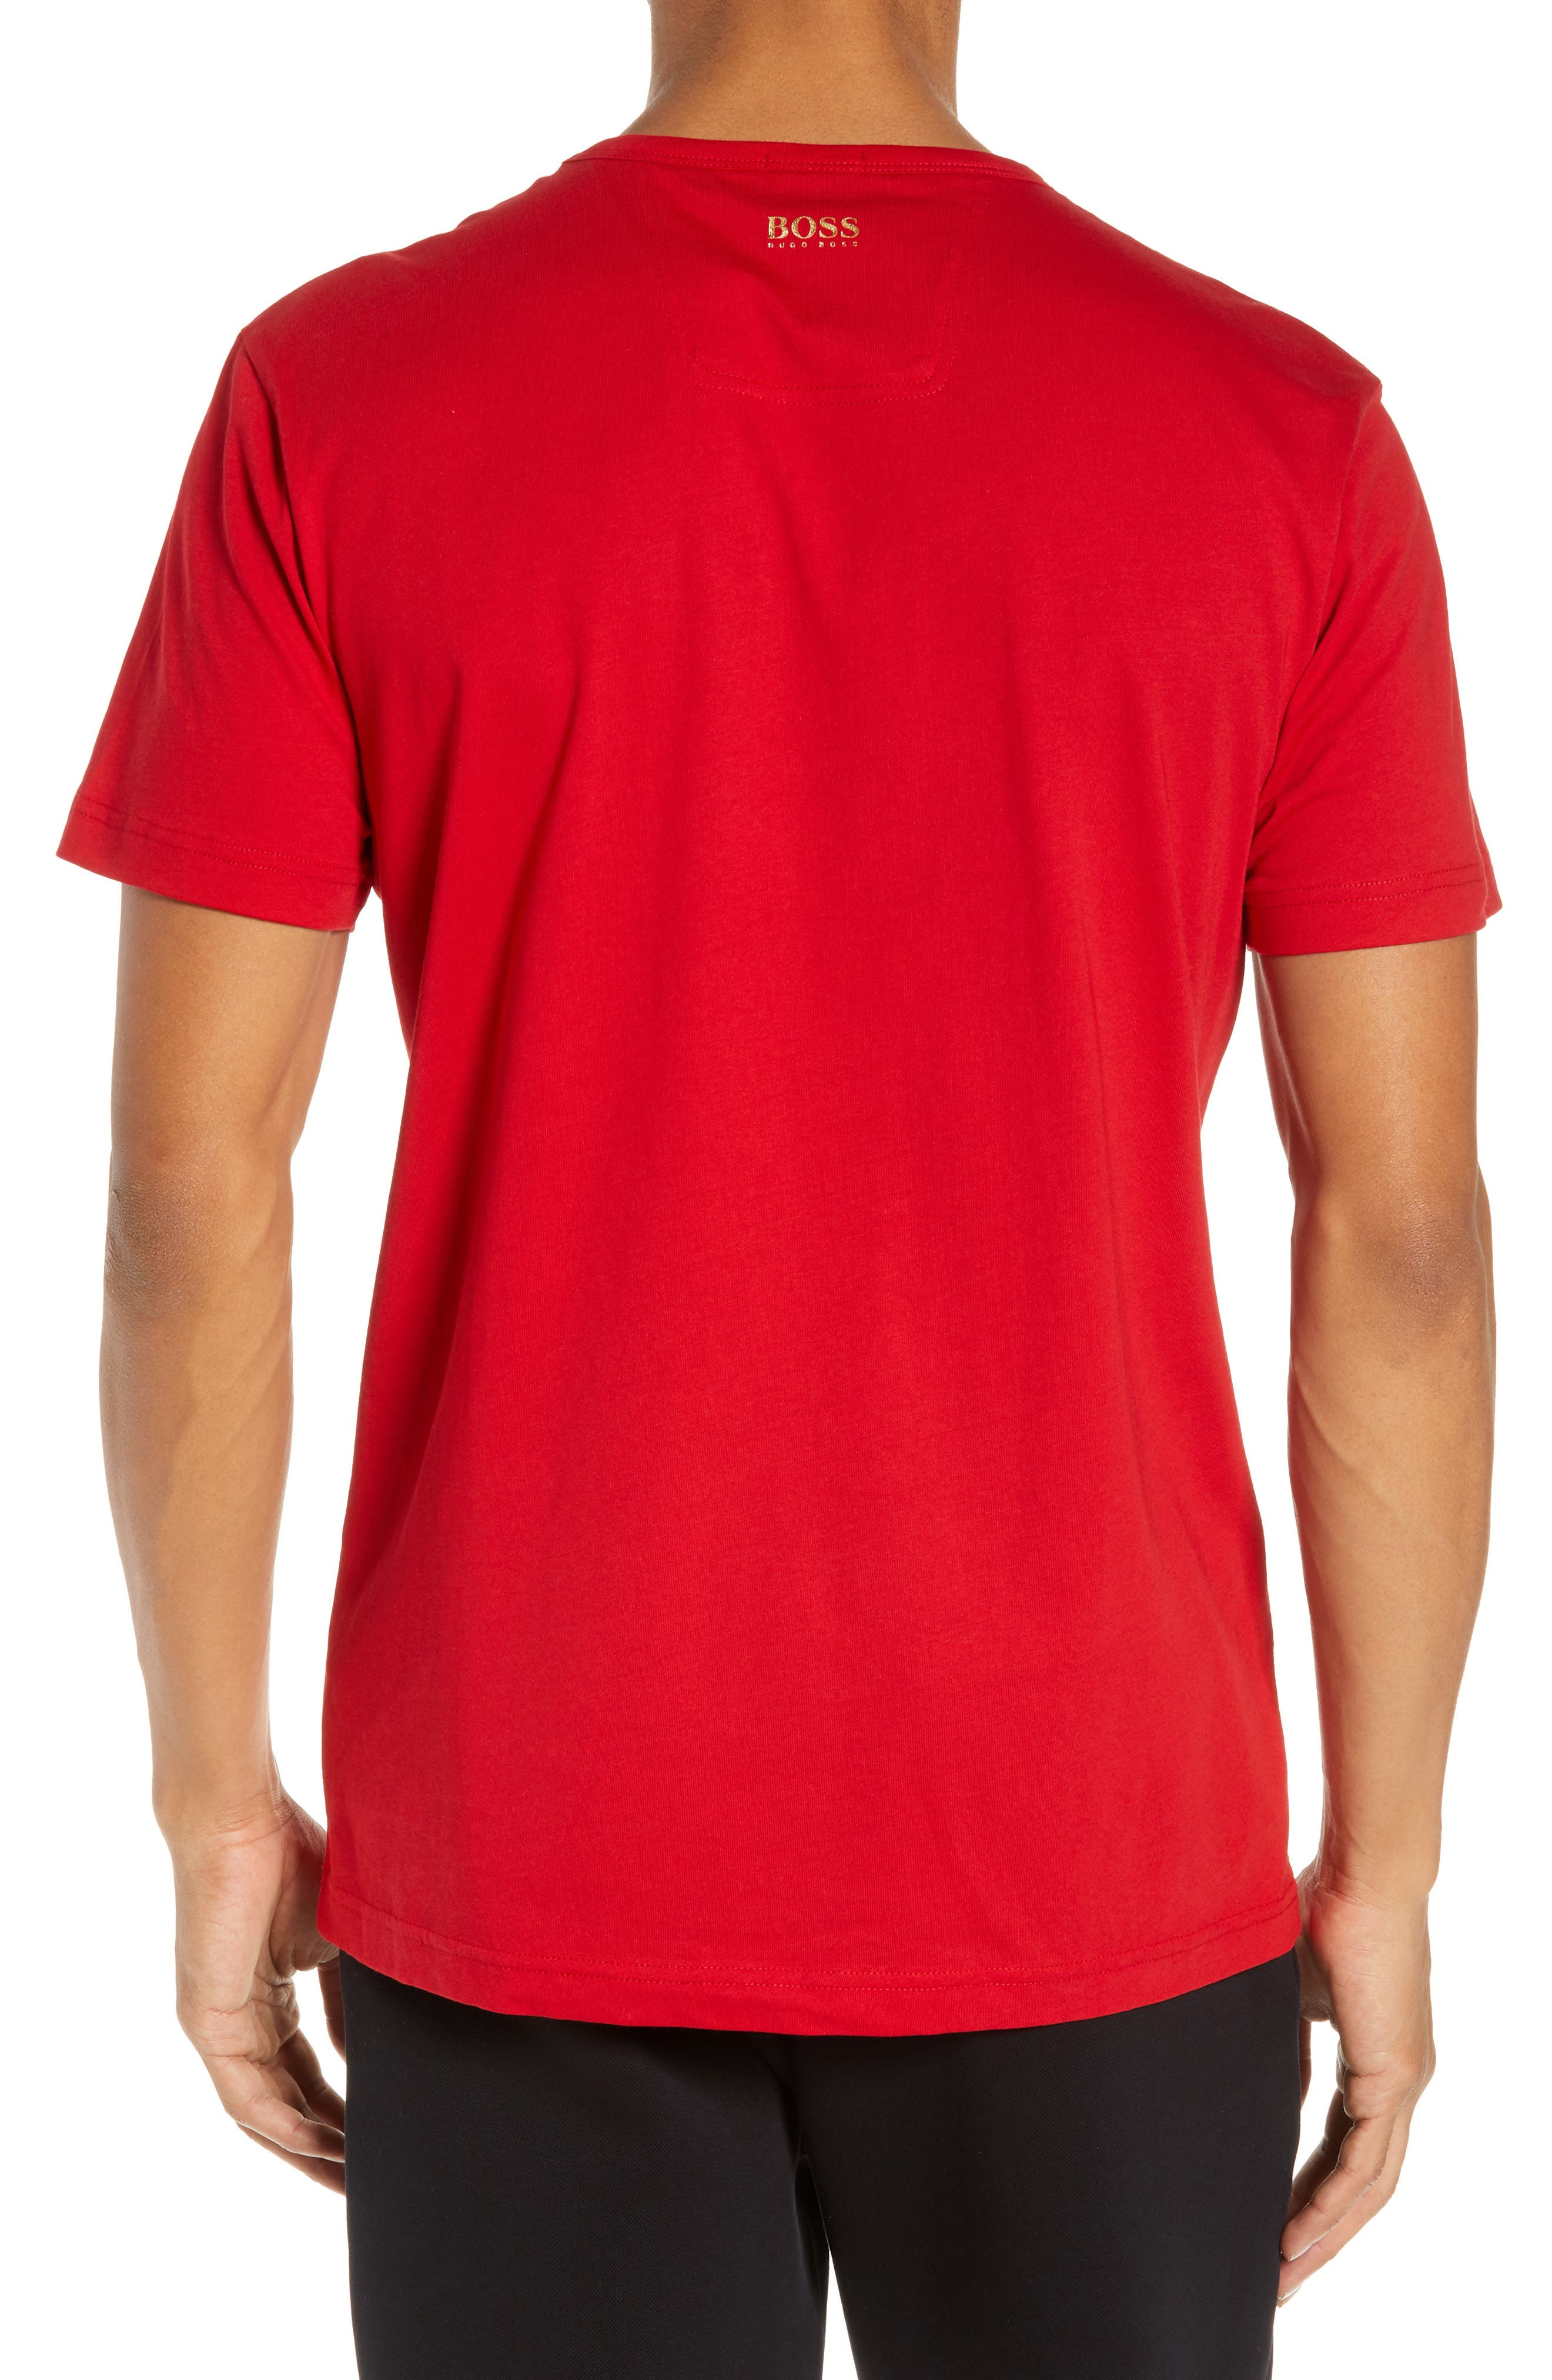 BOSS,                             CNY Regular Fit T-Shirt,                             Alternate thumbnail 2, color,                             RED